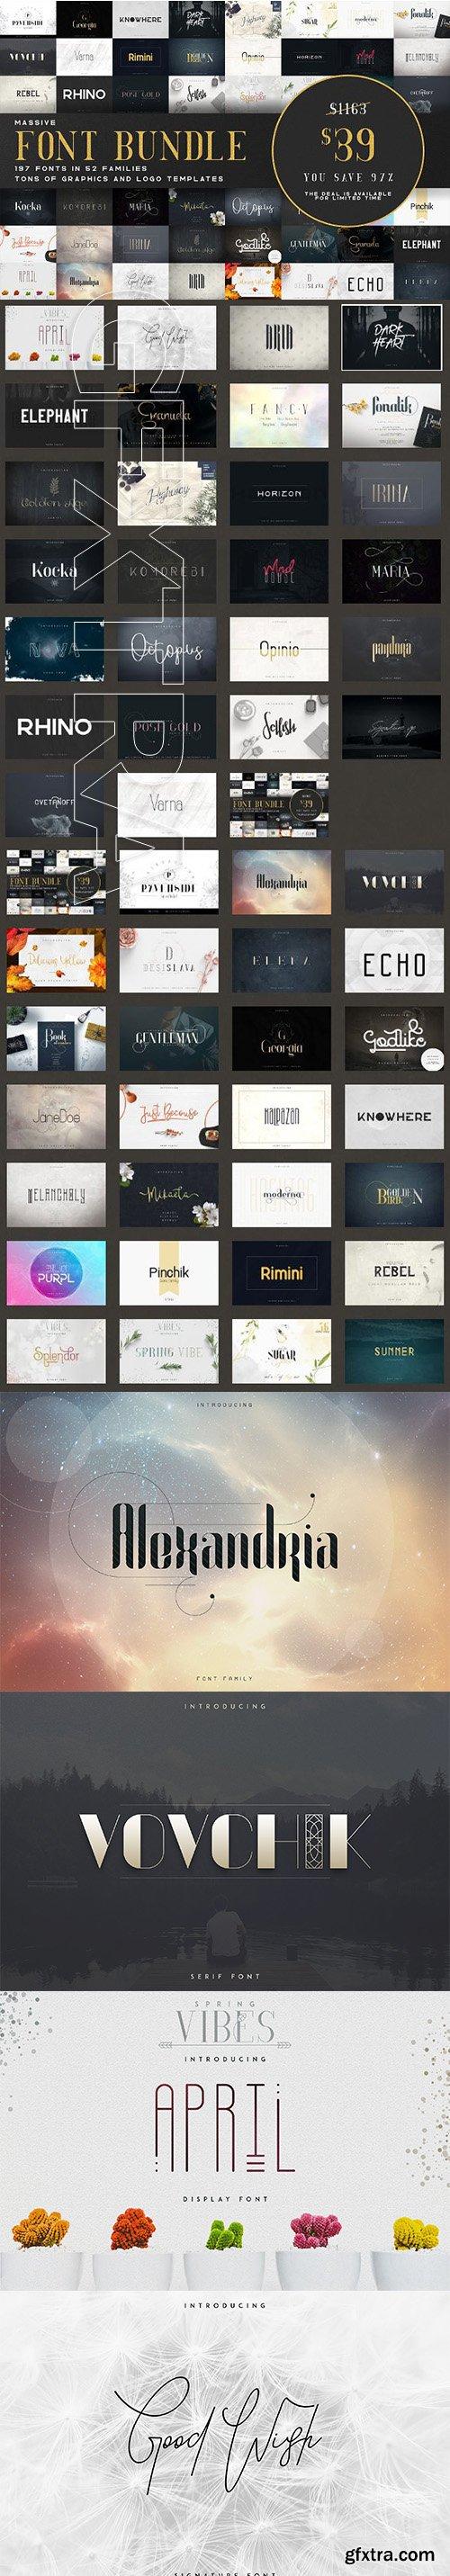 CreativeMarket - Massive Font Bundle - 197 fonts 3037602